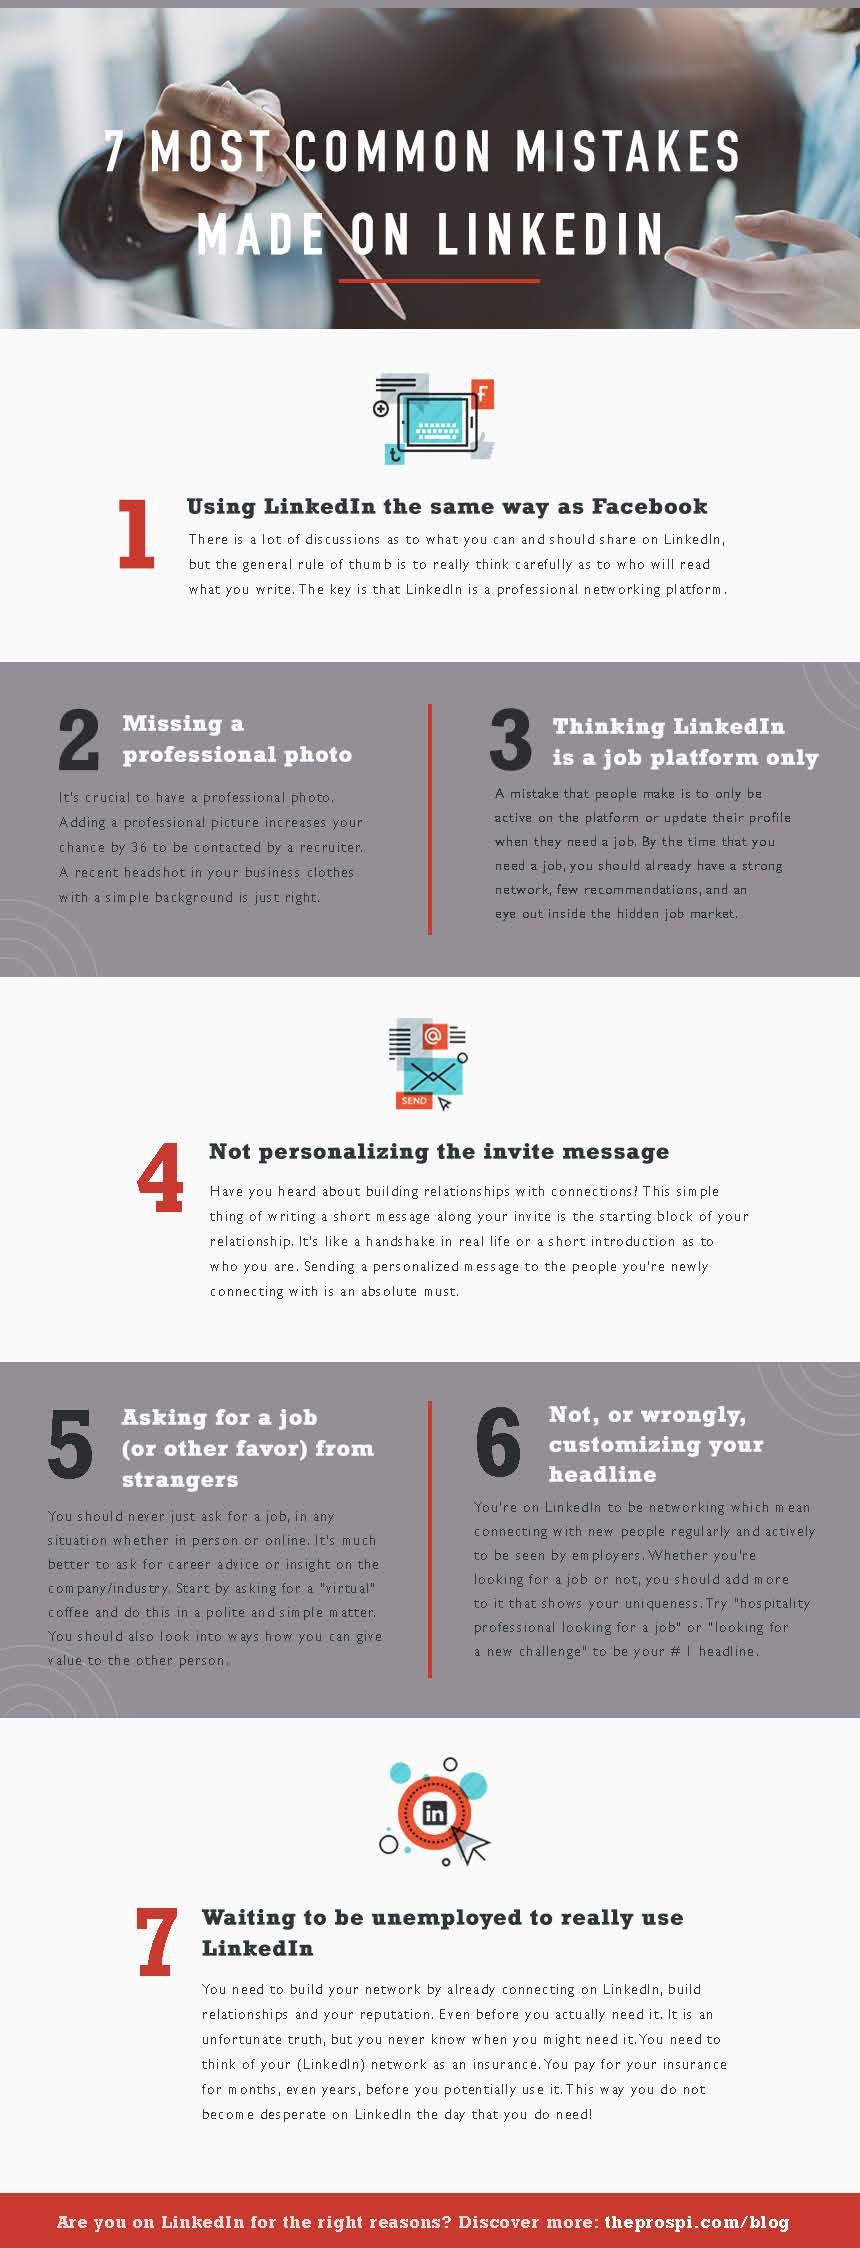 7 Common Linkedin Mistakes.jpg